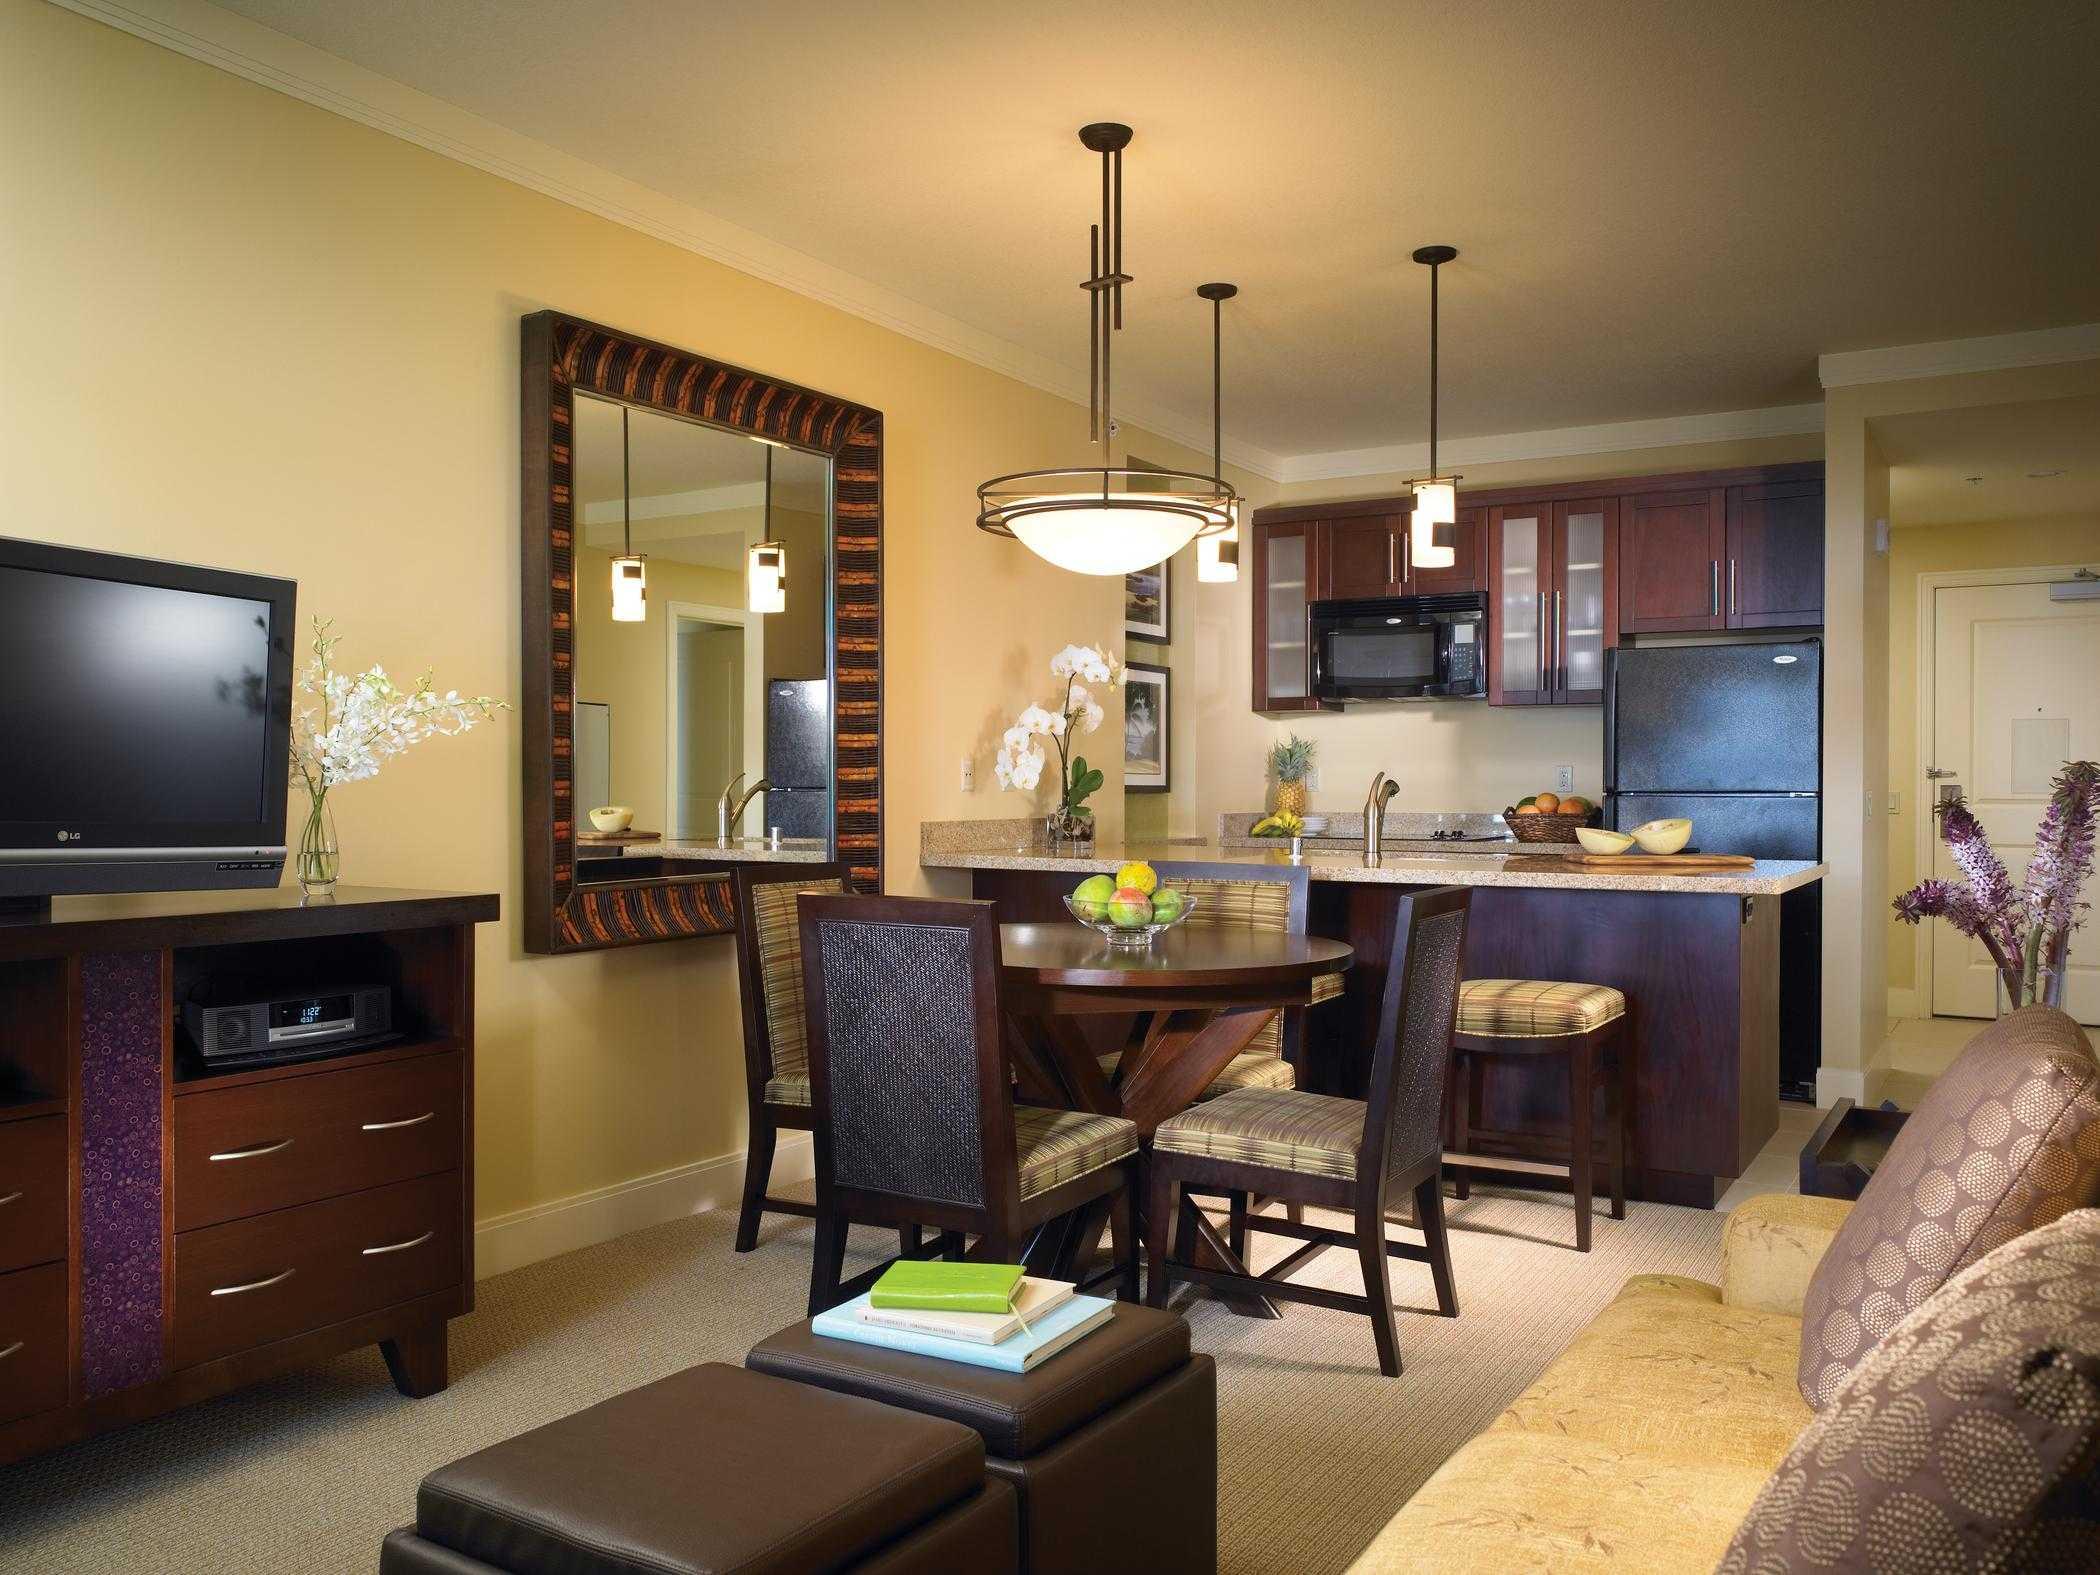 maui hotels with kitchens baxton studio kitchen cart tug westin ka 39anapali ocean resort villas